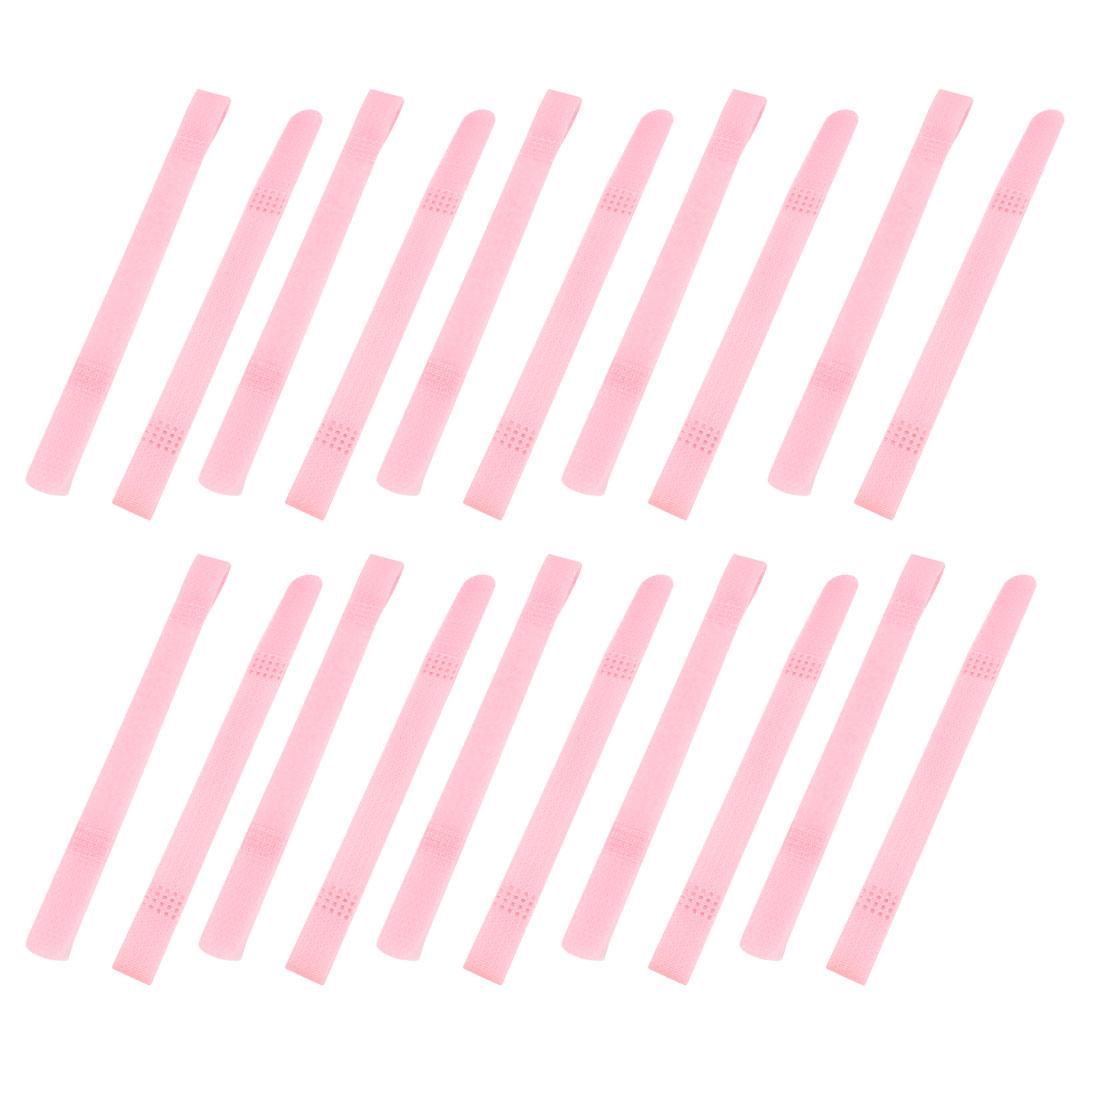 Nylon Reusable Fastener Hook Loop Tie Strap Cable Band Belt Pink 20 Pcs